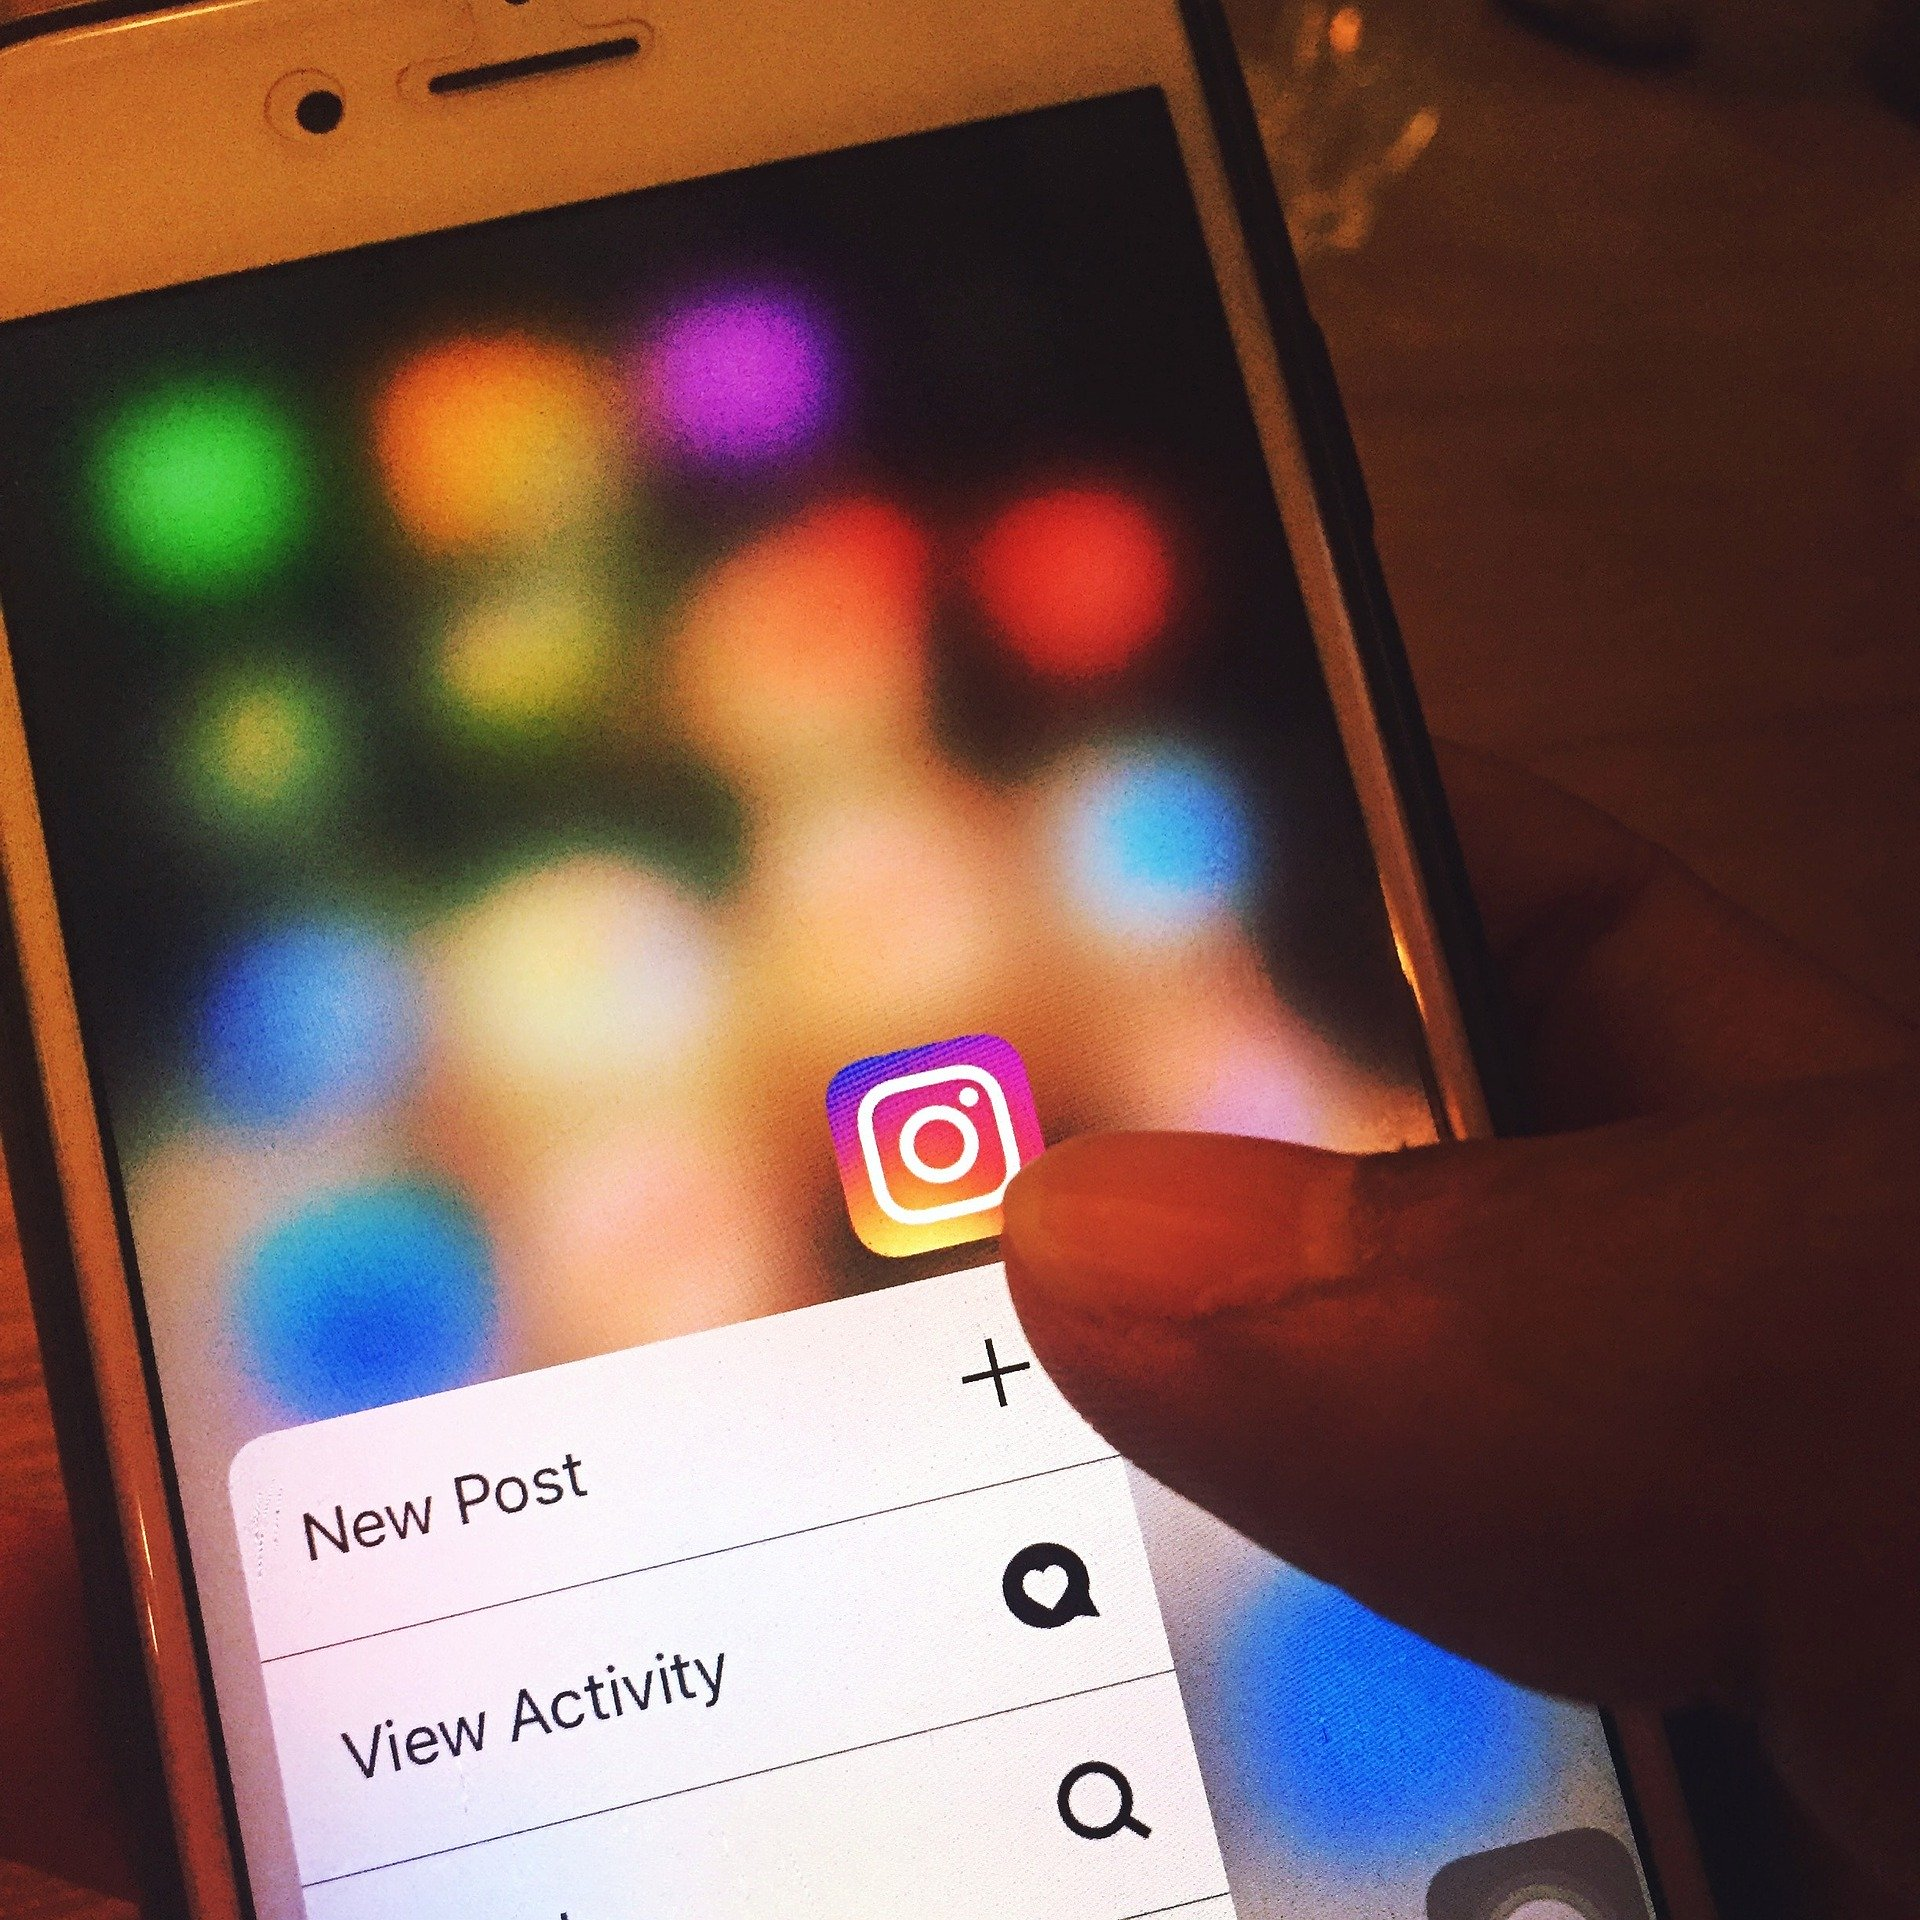 Quand poster sur Instagram?